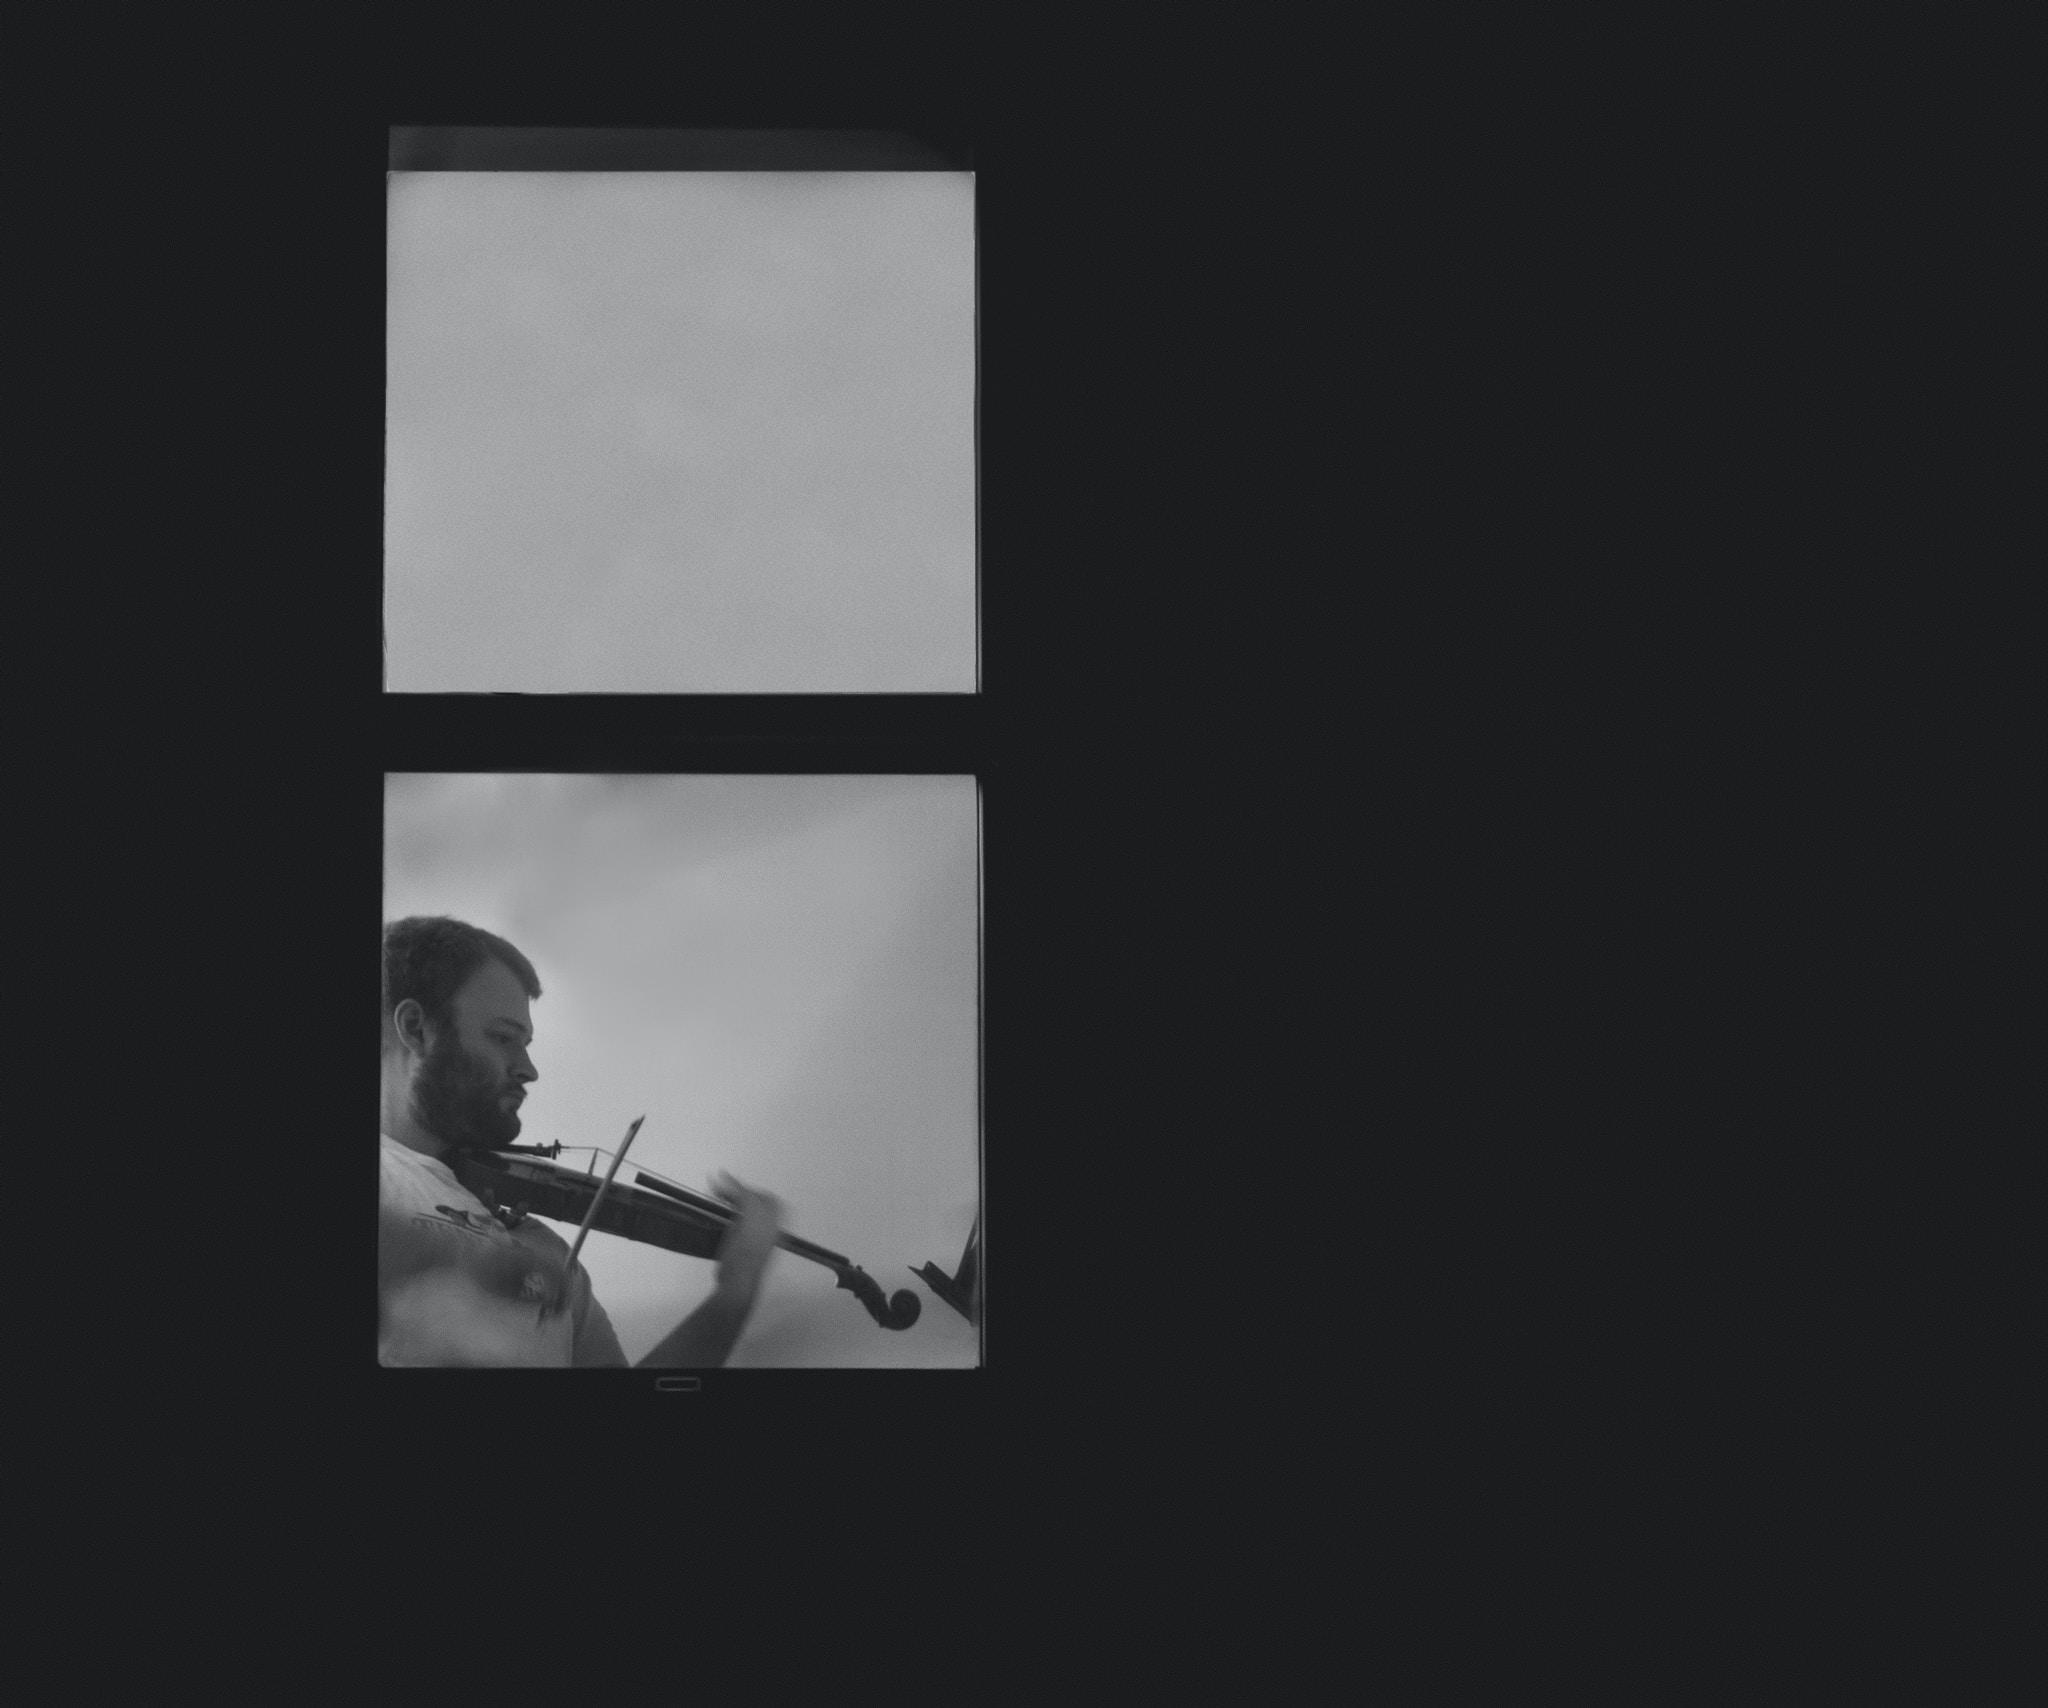 man playing violin near glass window